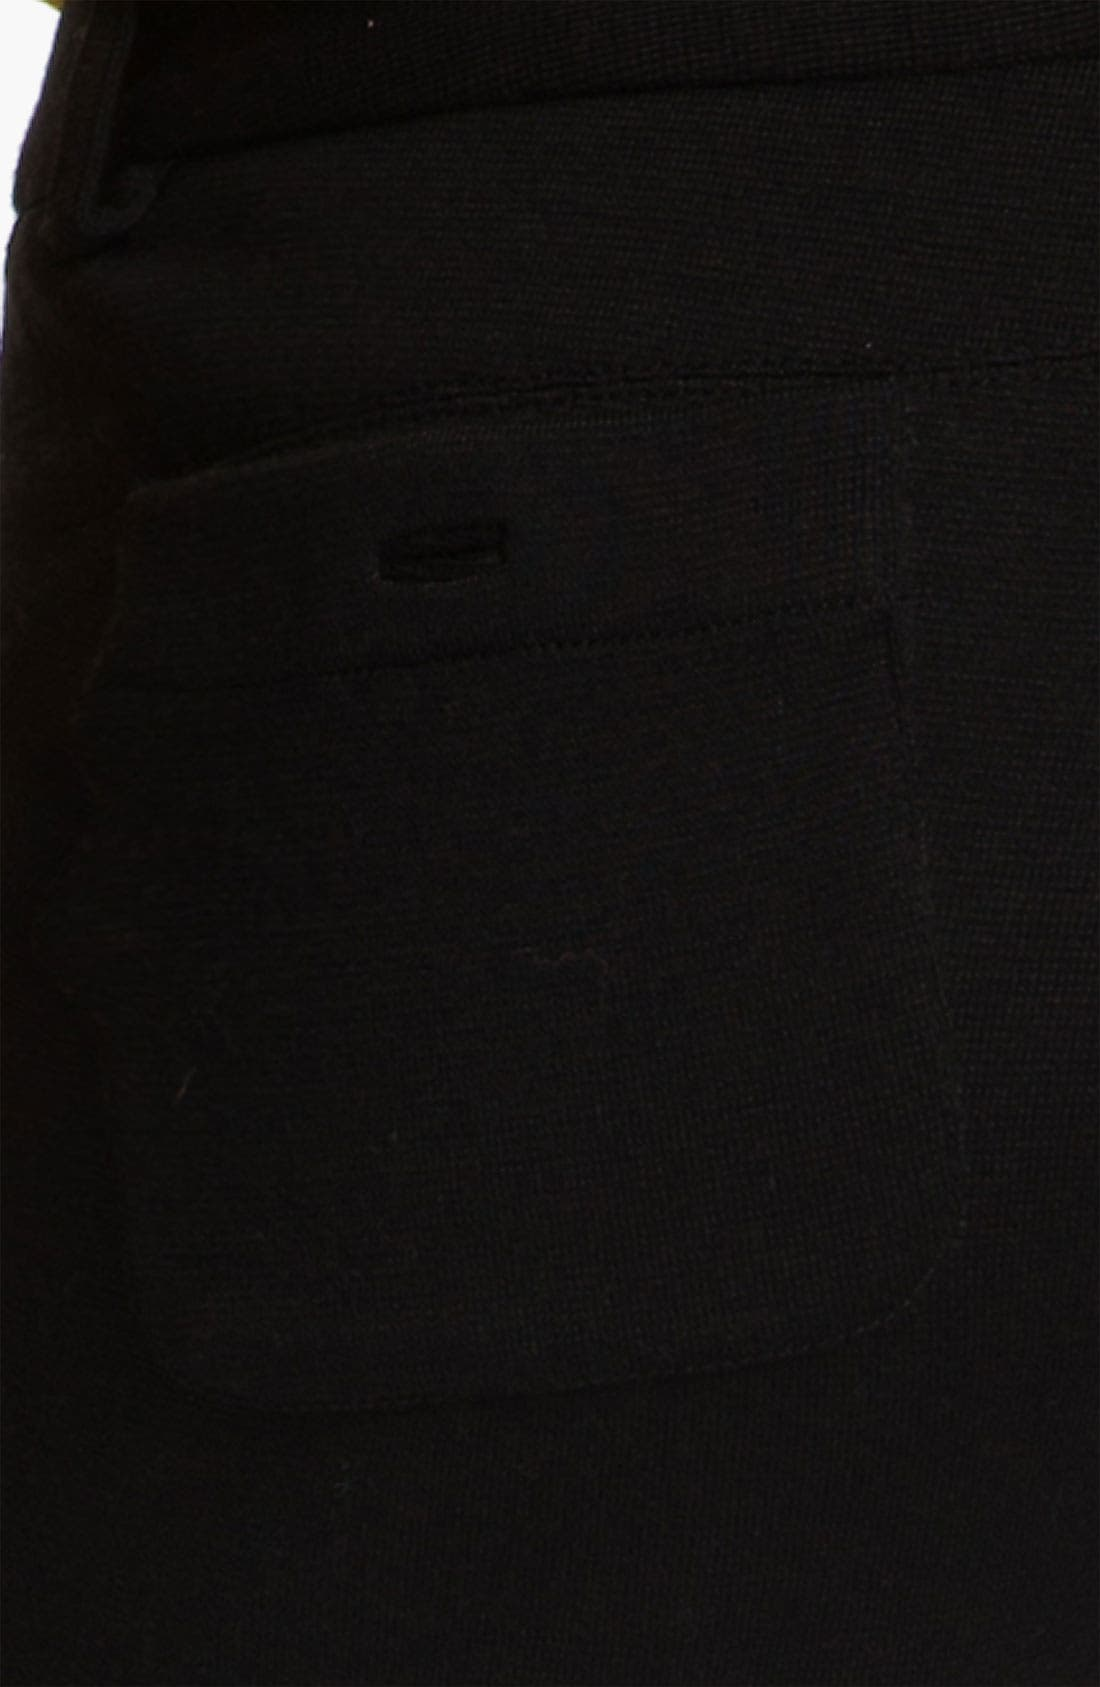 Alternate Image 3  - Tory Burch 'Beverly' Crop Pants